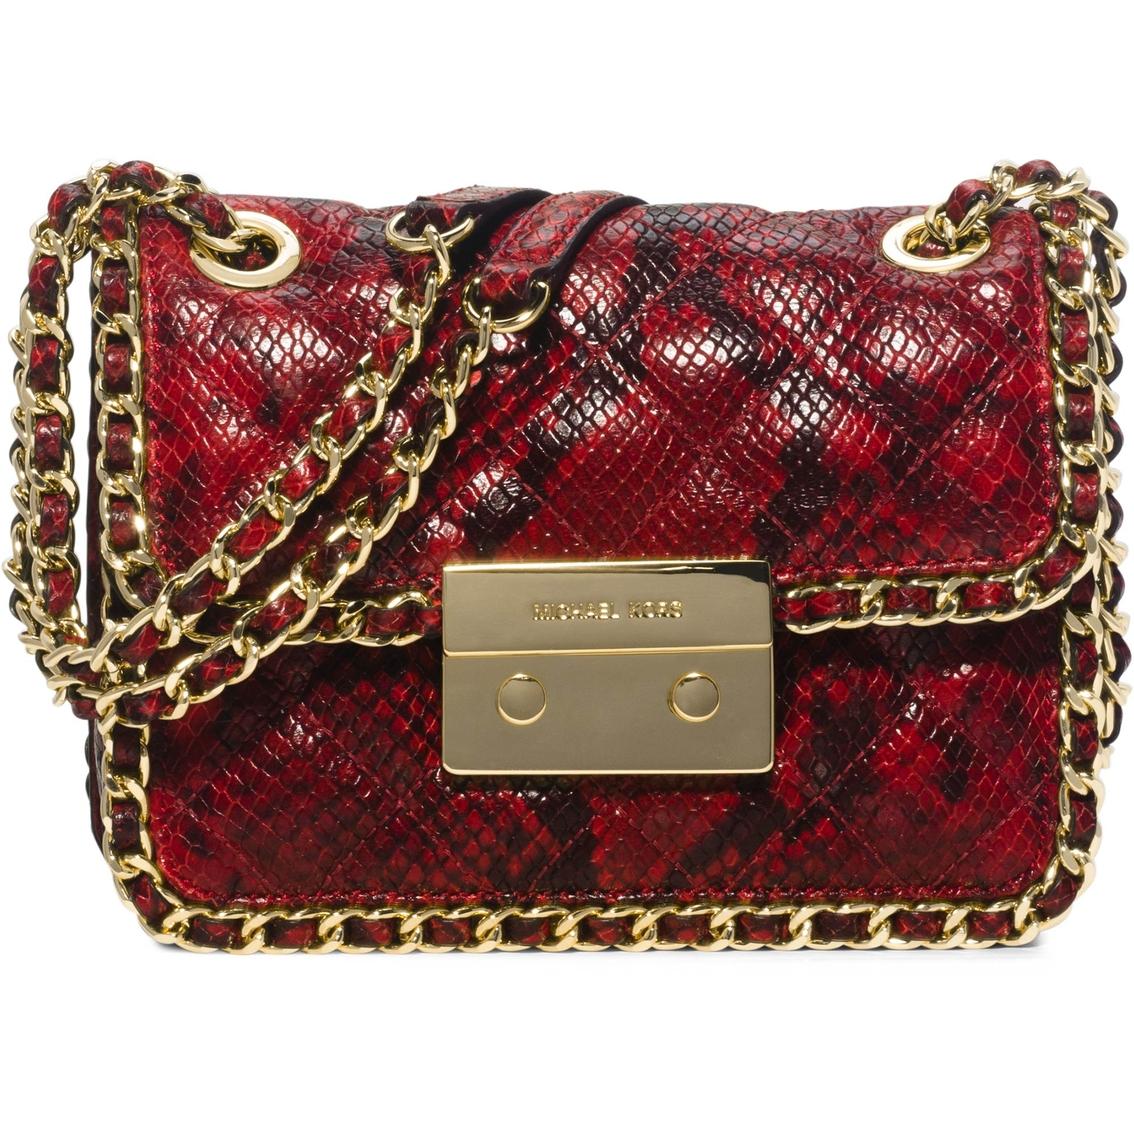 637b15b15216 Michael Kors Carine Medium Shoulder Bag